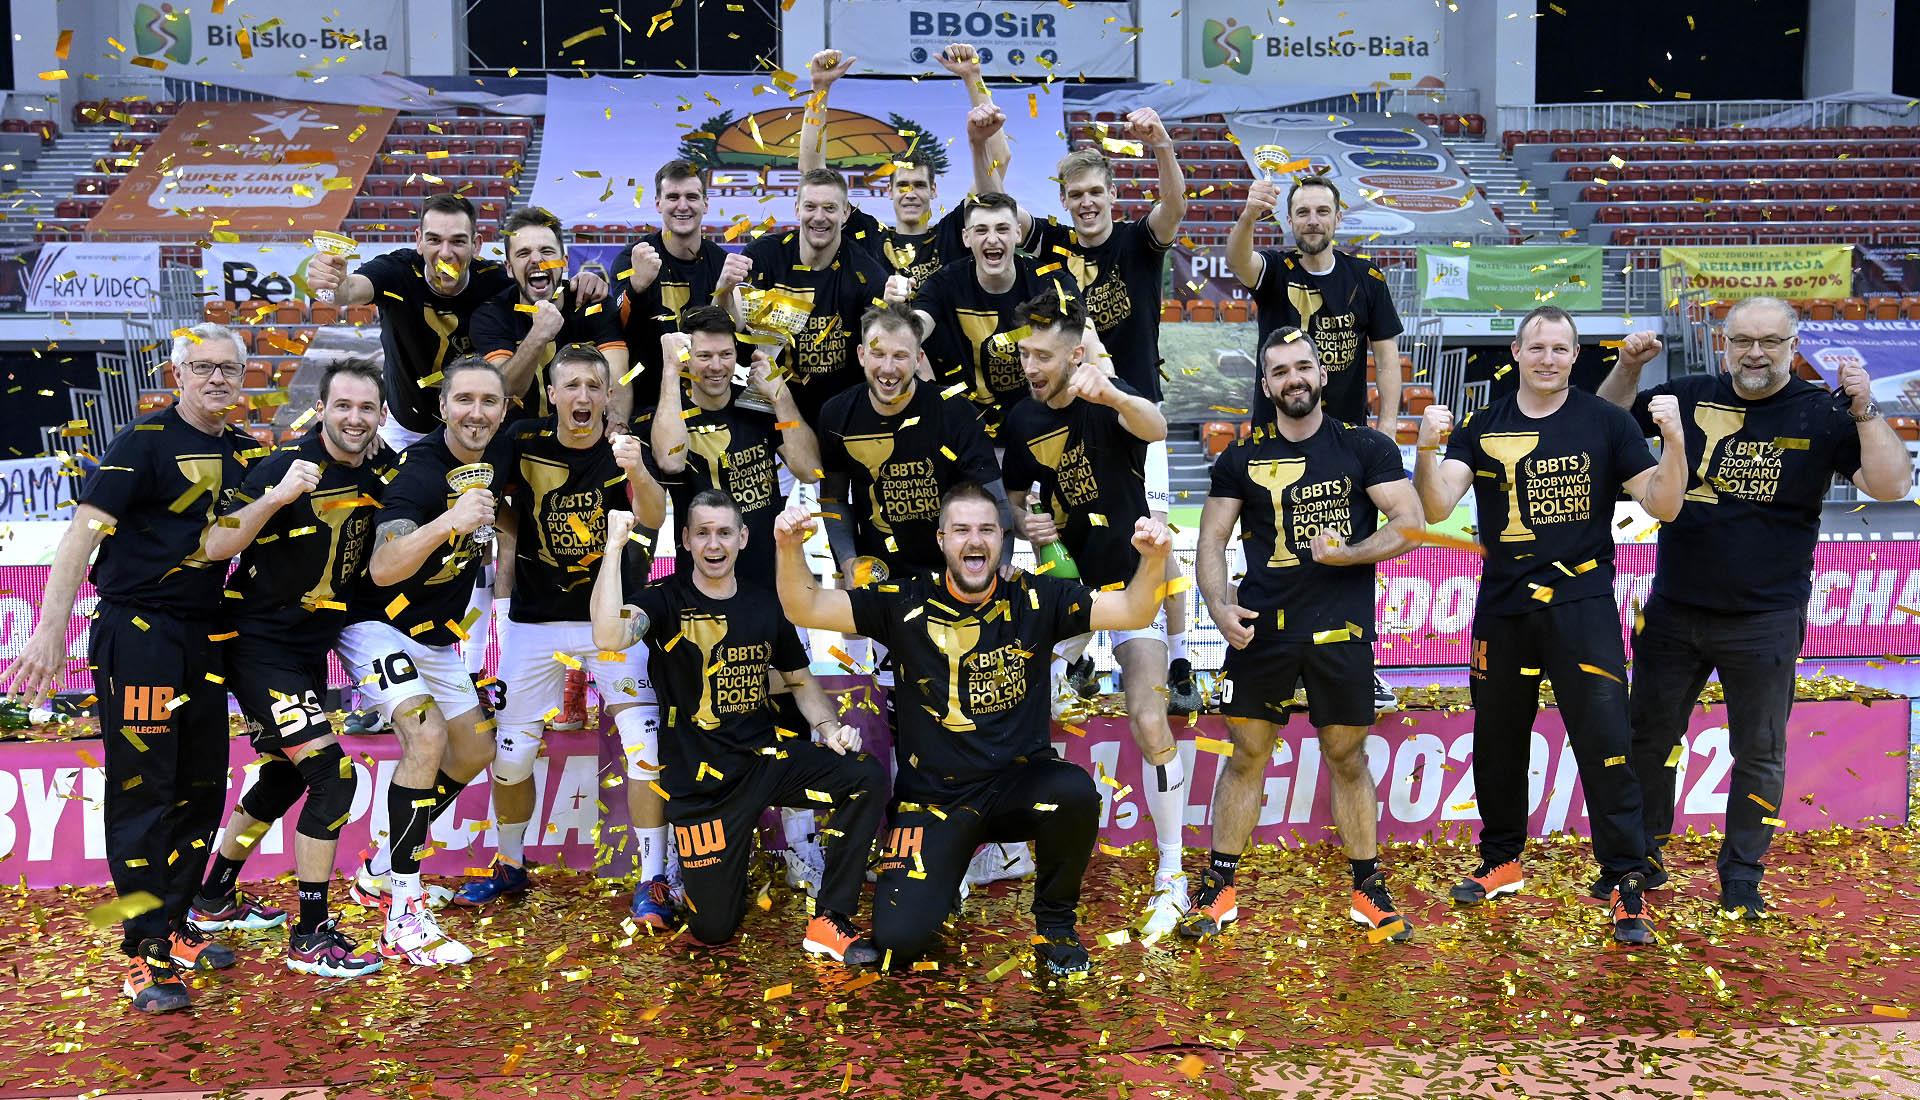 Zdobyli Puchar Polski drugi raz z rzędu!